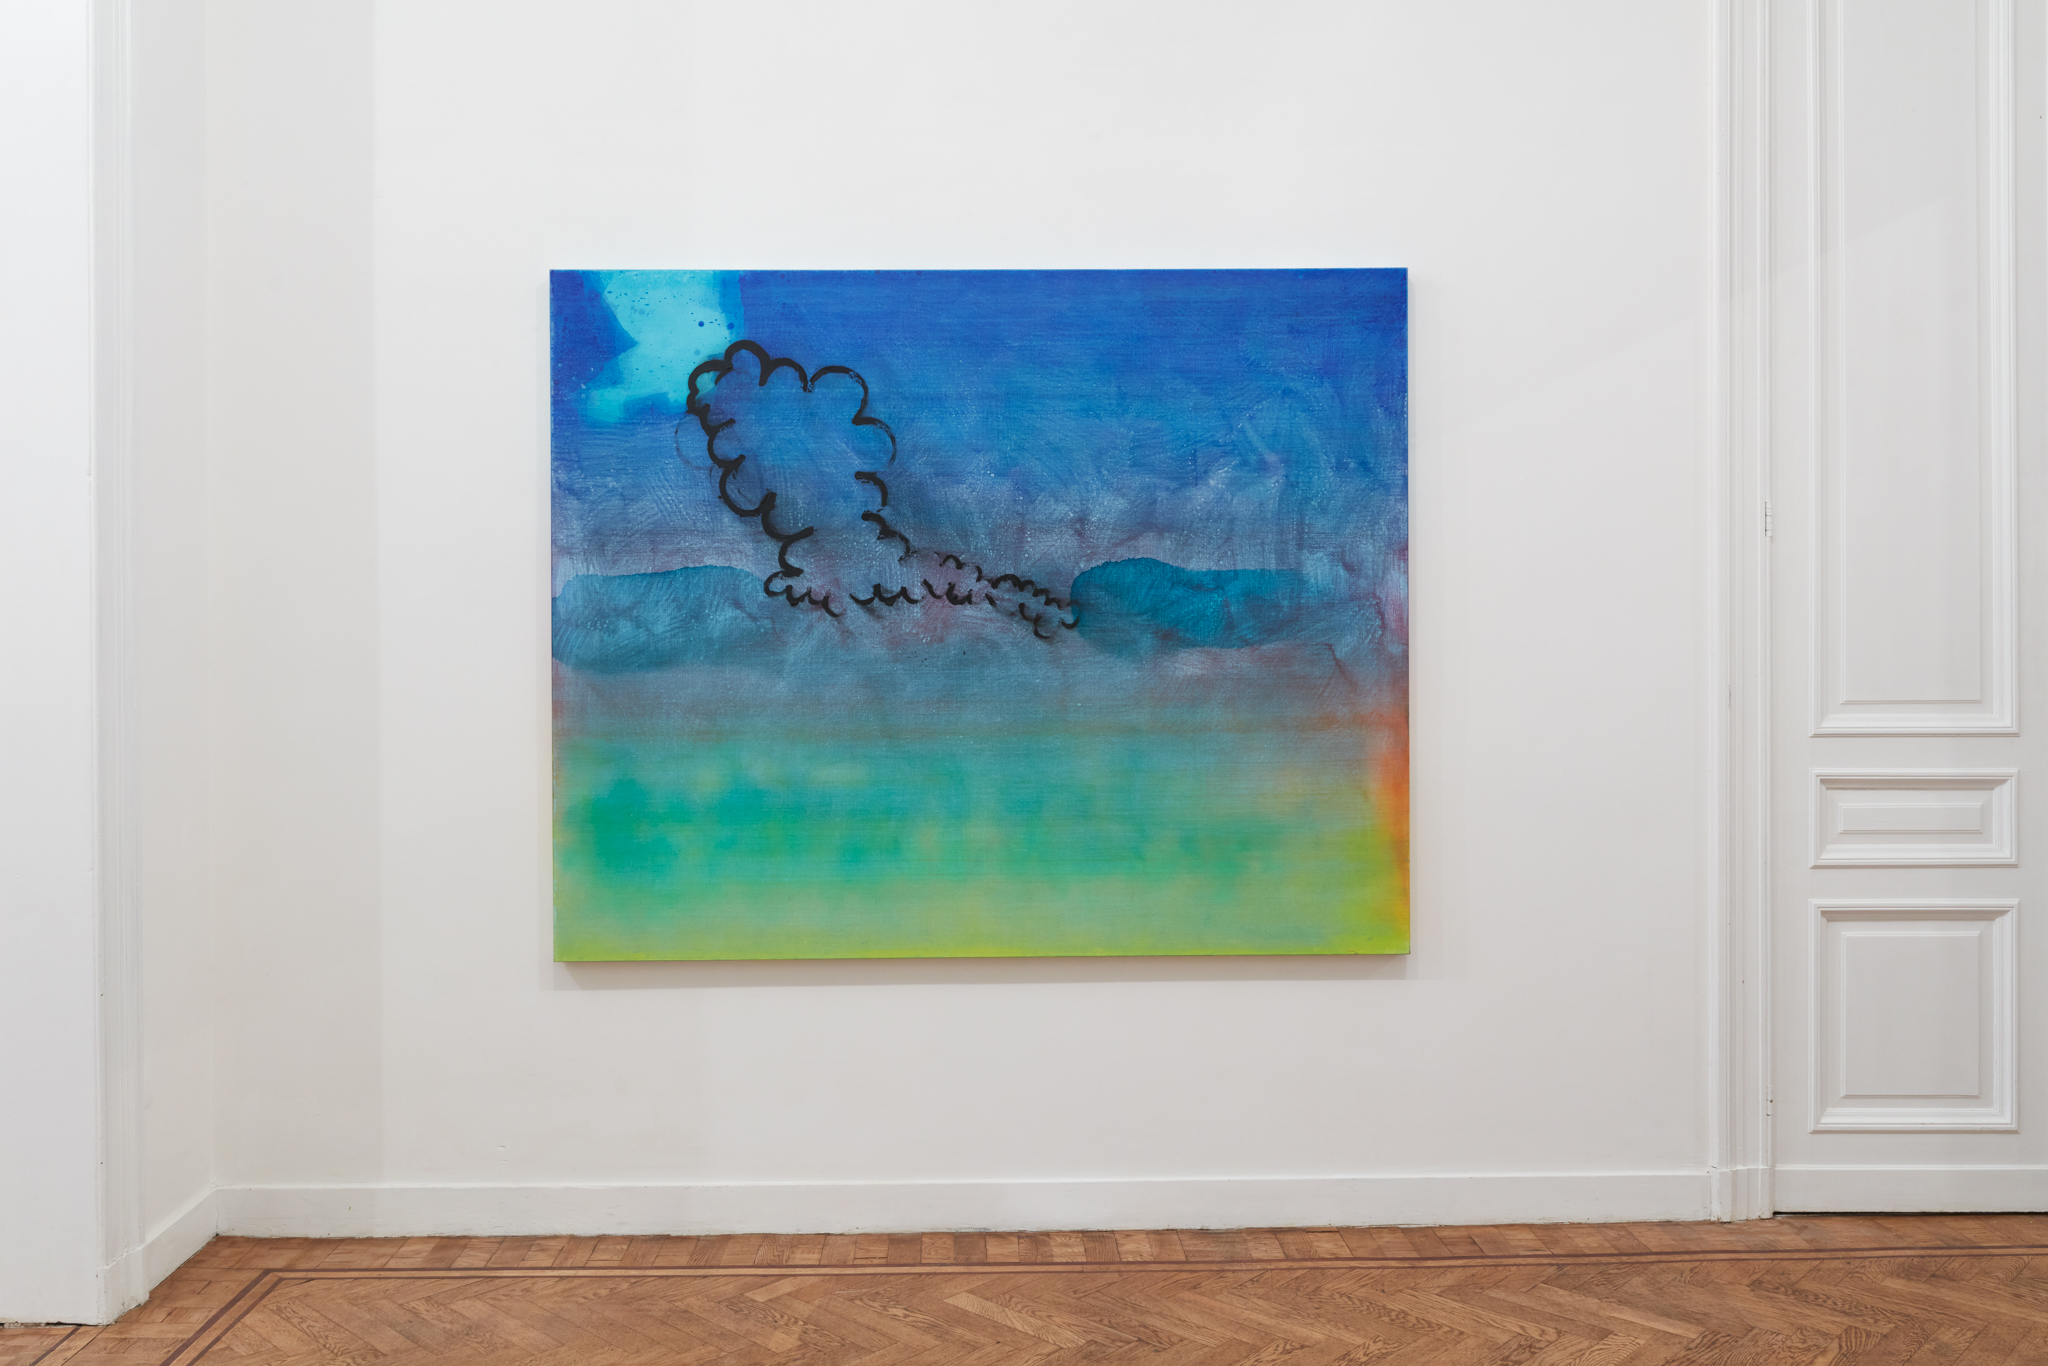 Rik Moens - Untitled, 2019